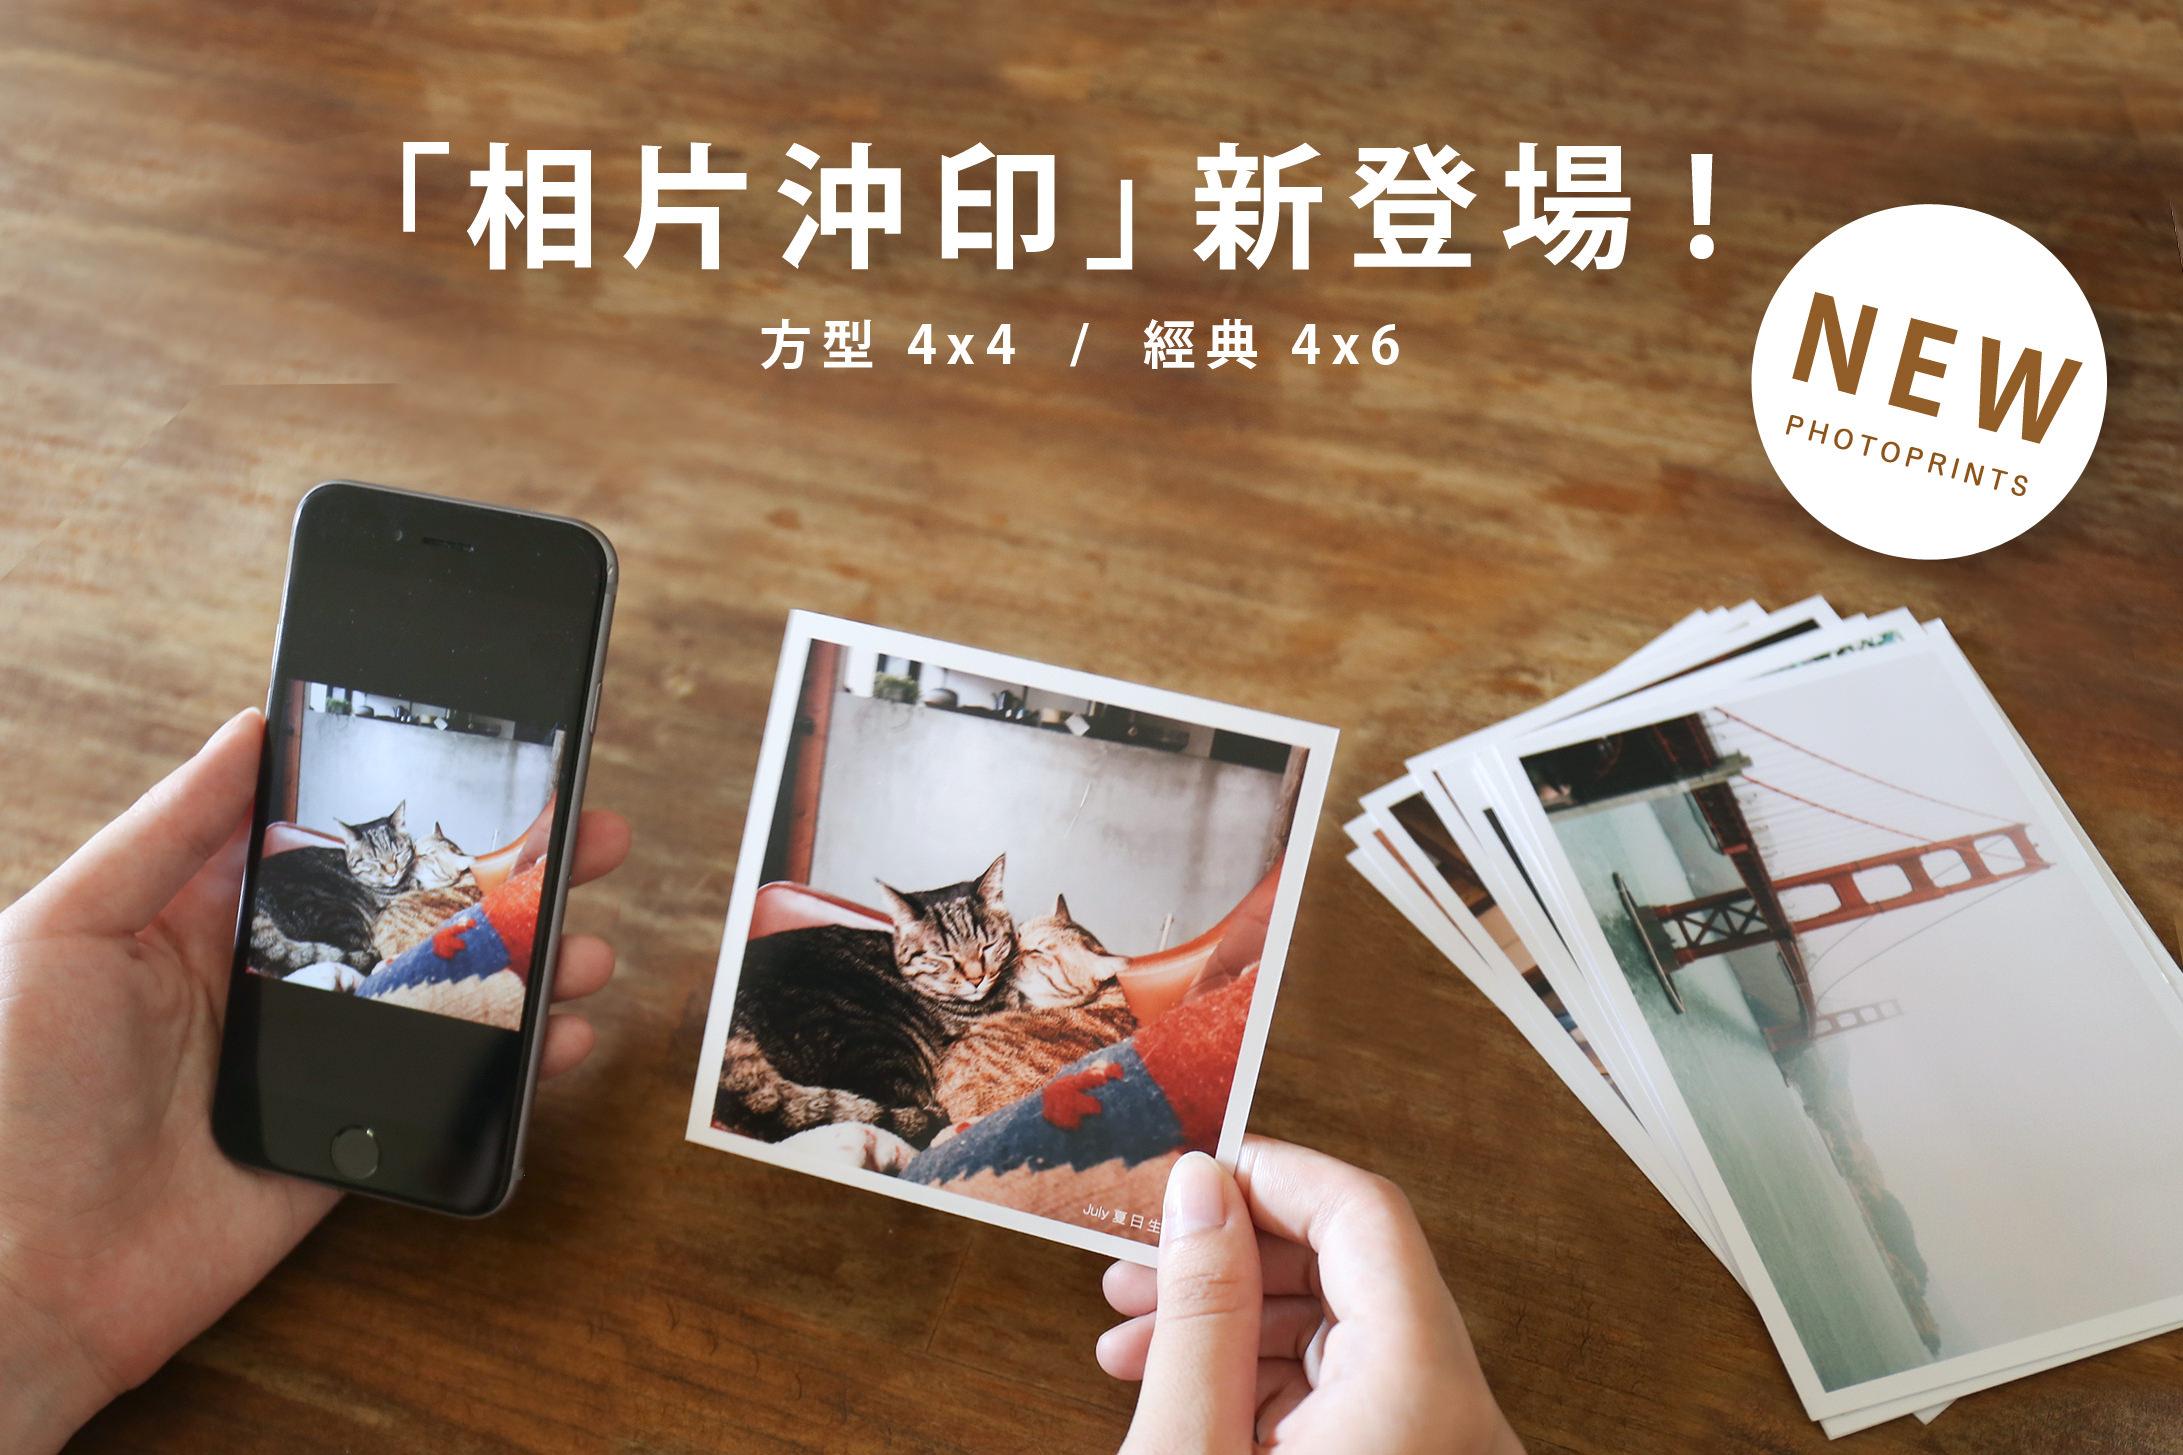 photoprints-image-new2_mini